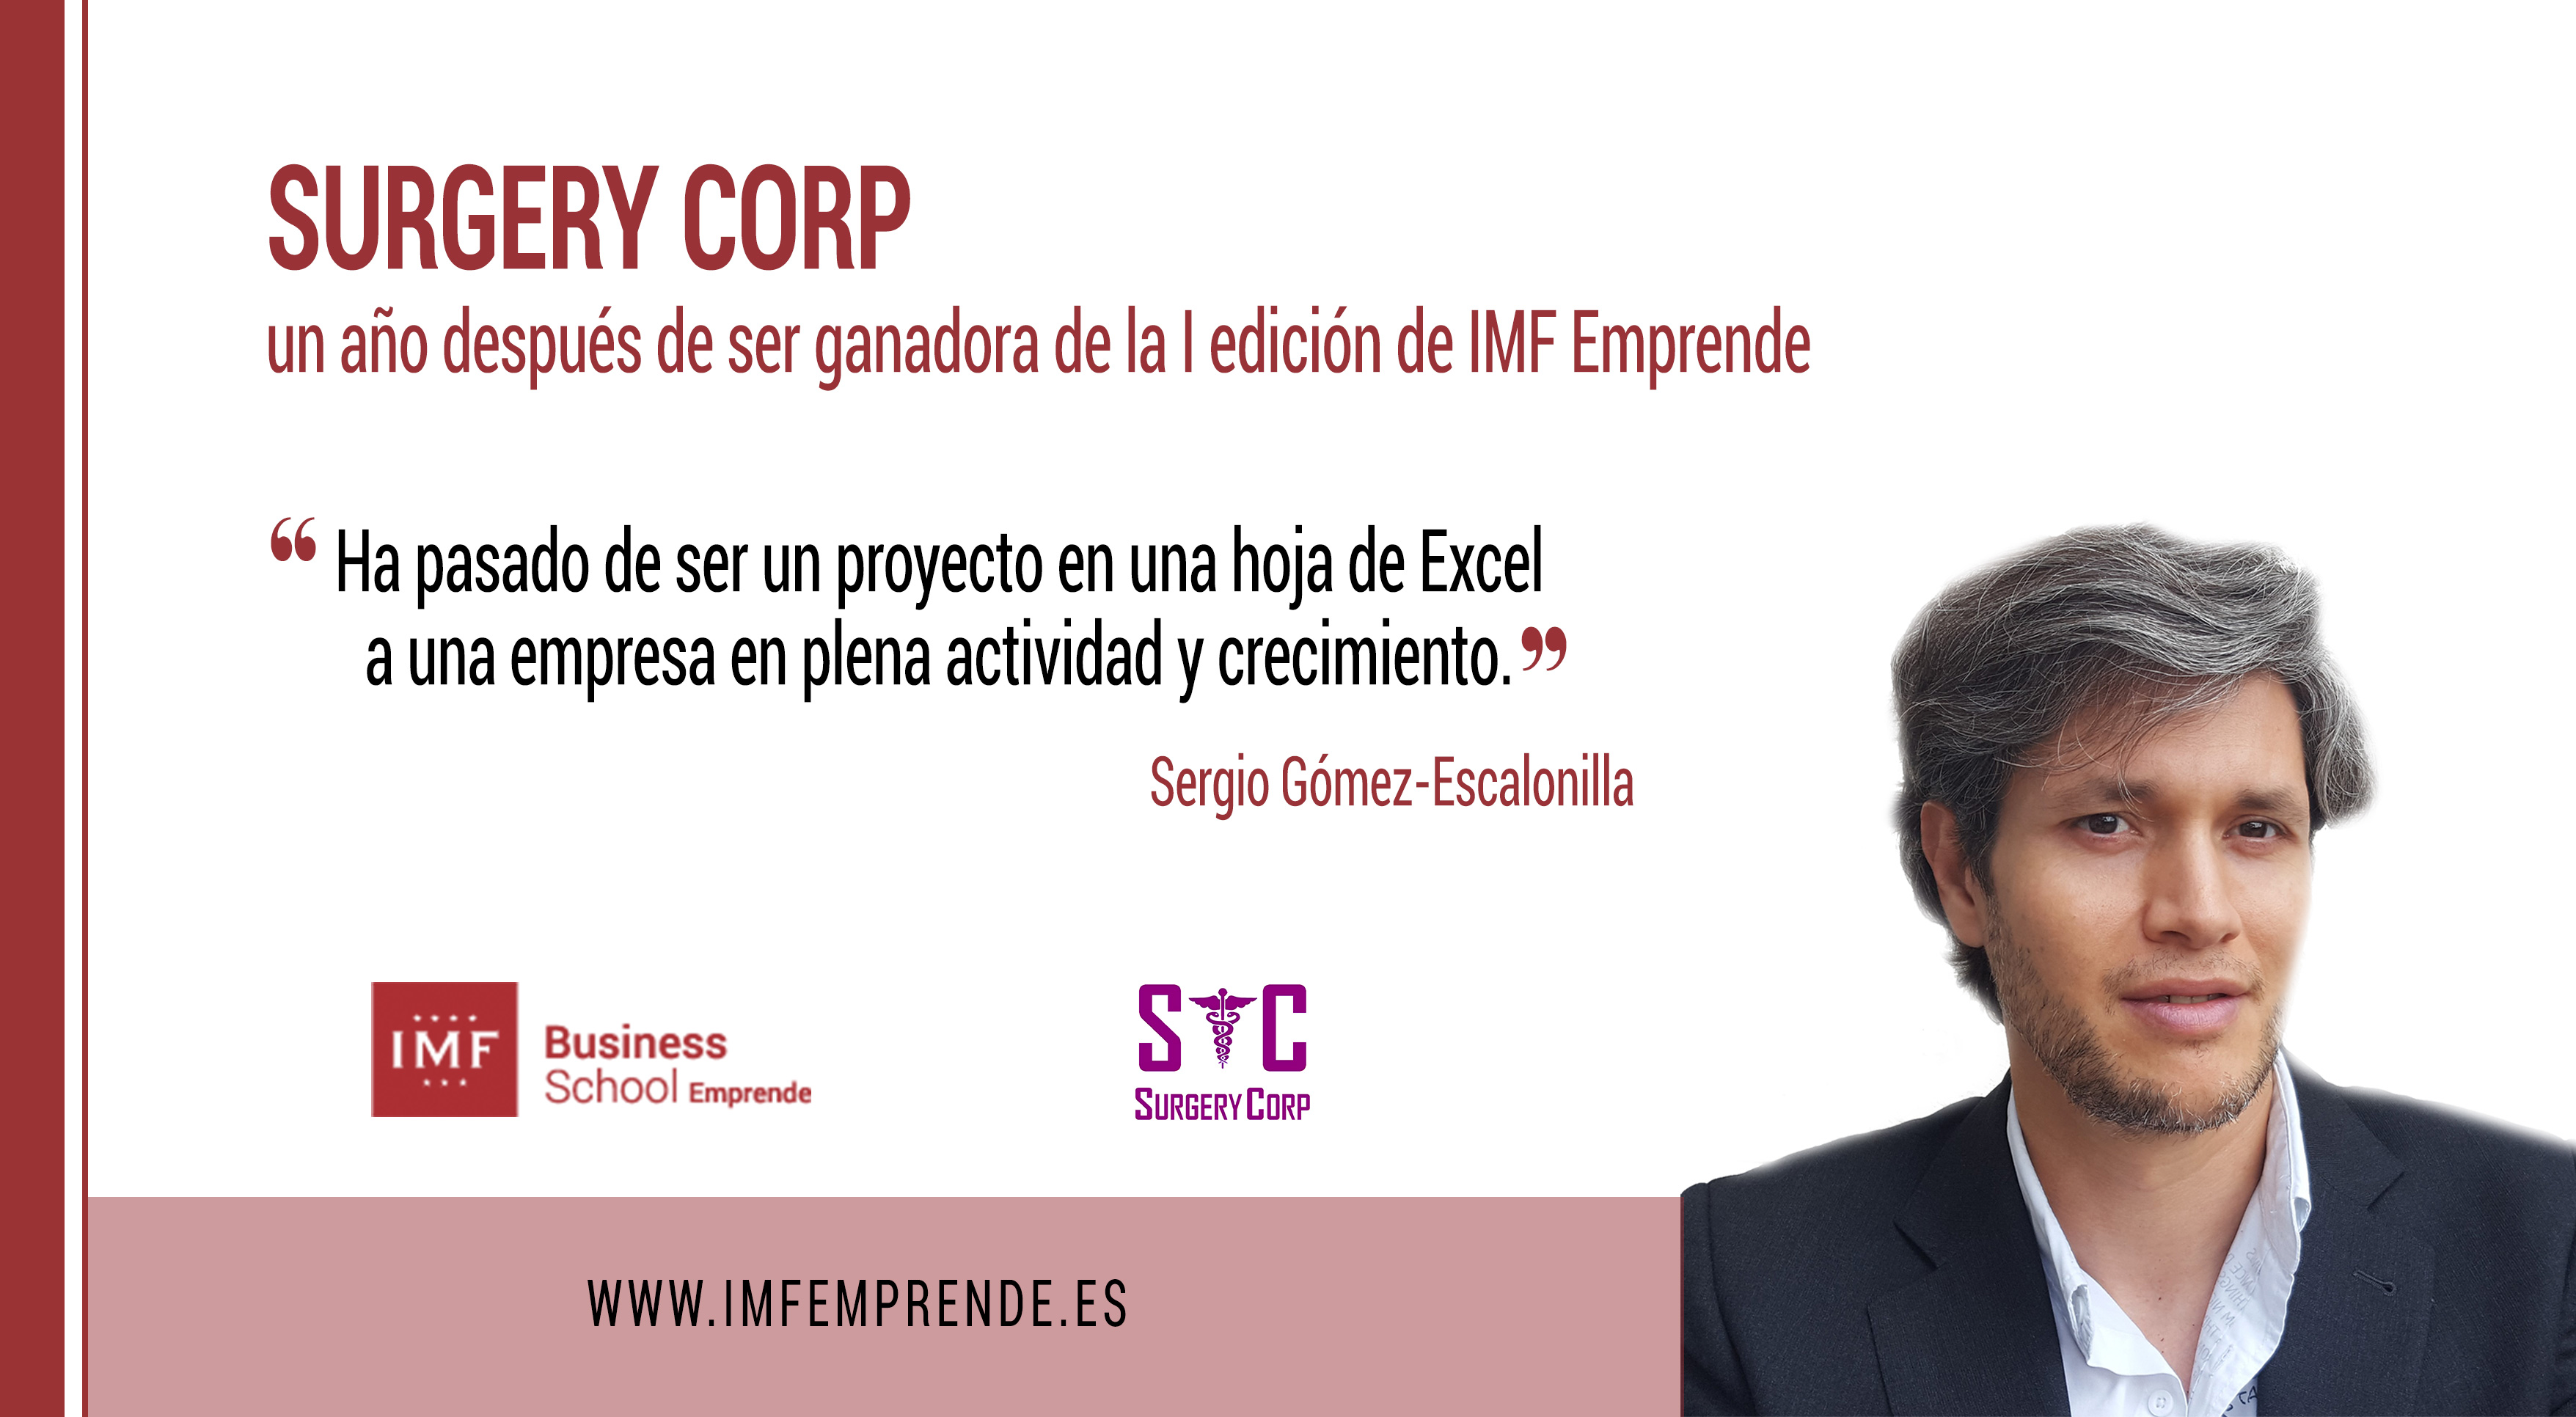 surgery-corp-ganador-imf-emprende-i-edicion Surgery Corp, un año después de ser ganador de la I edición de IMF Emprende